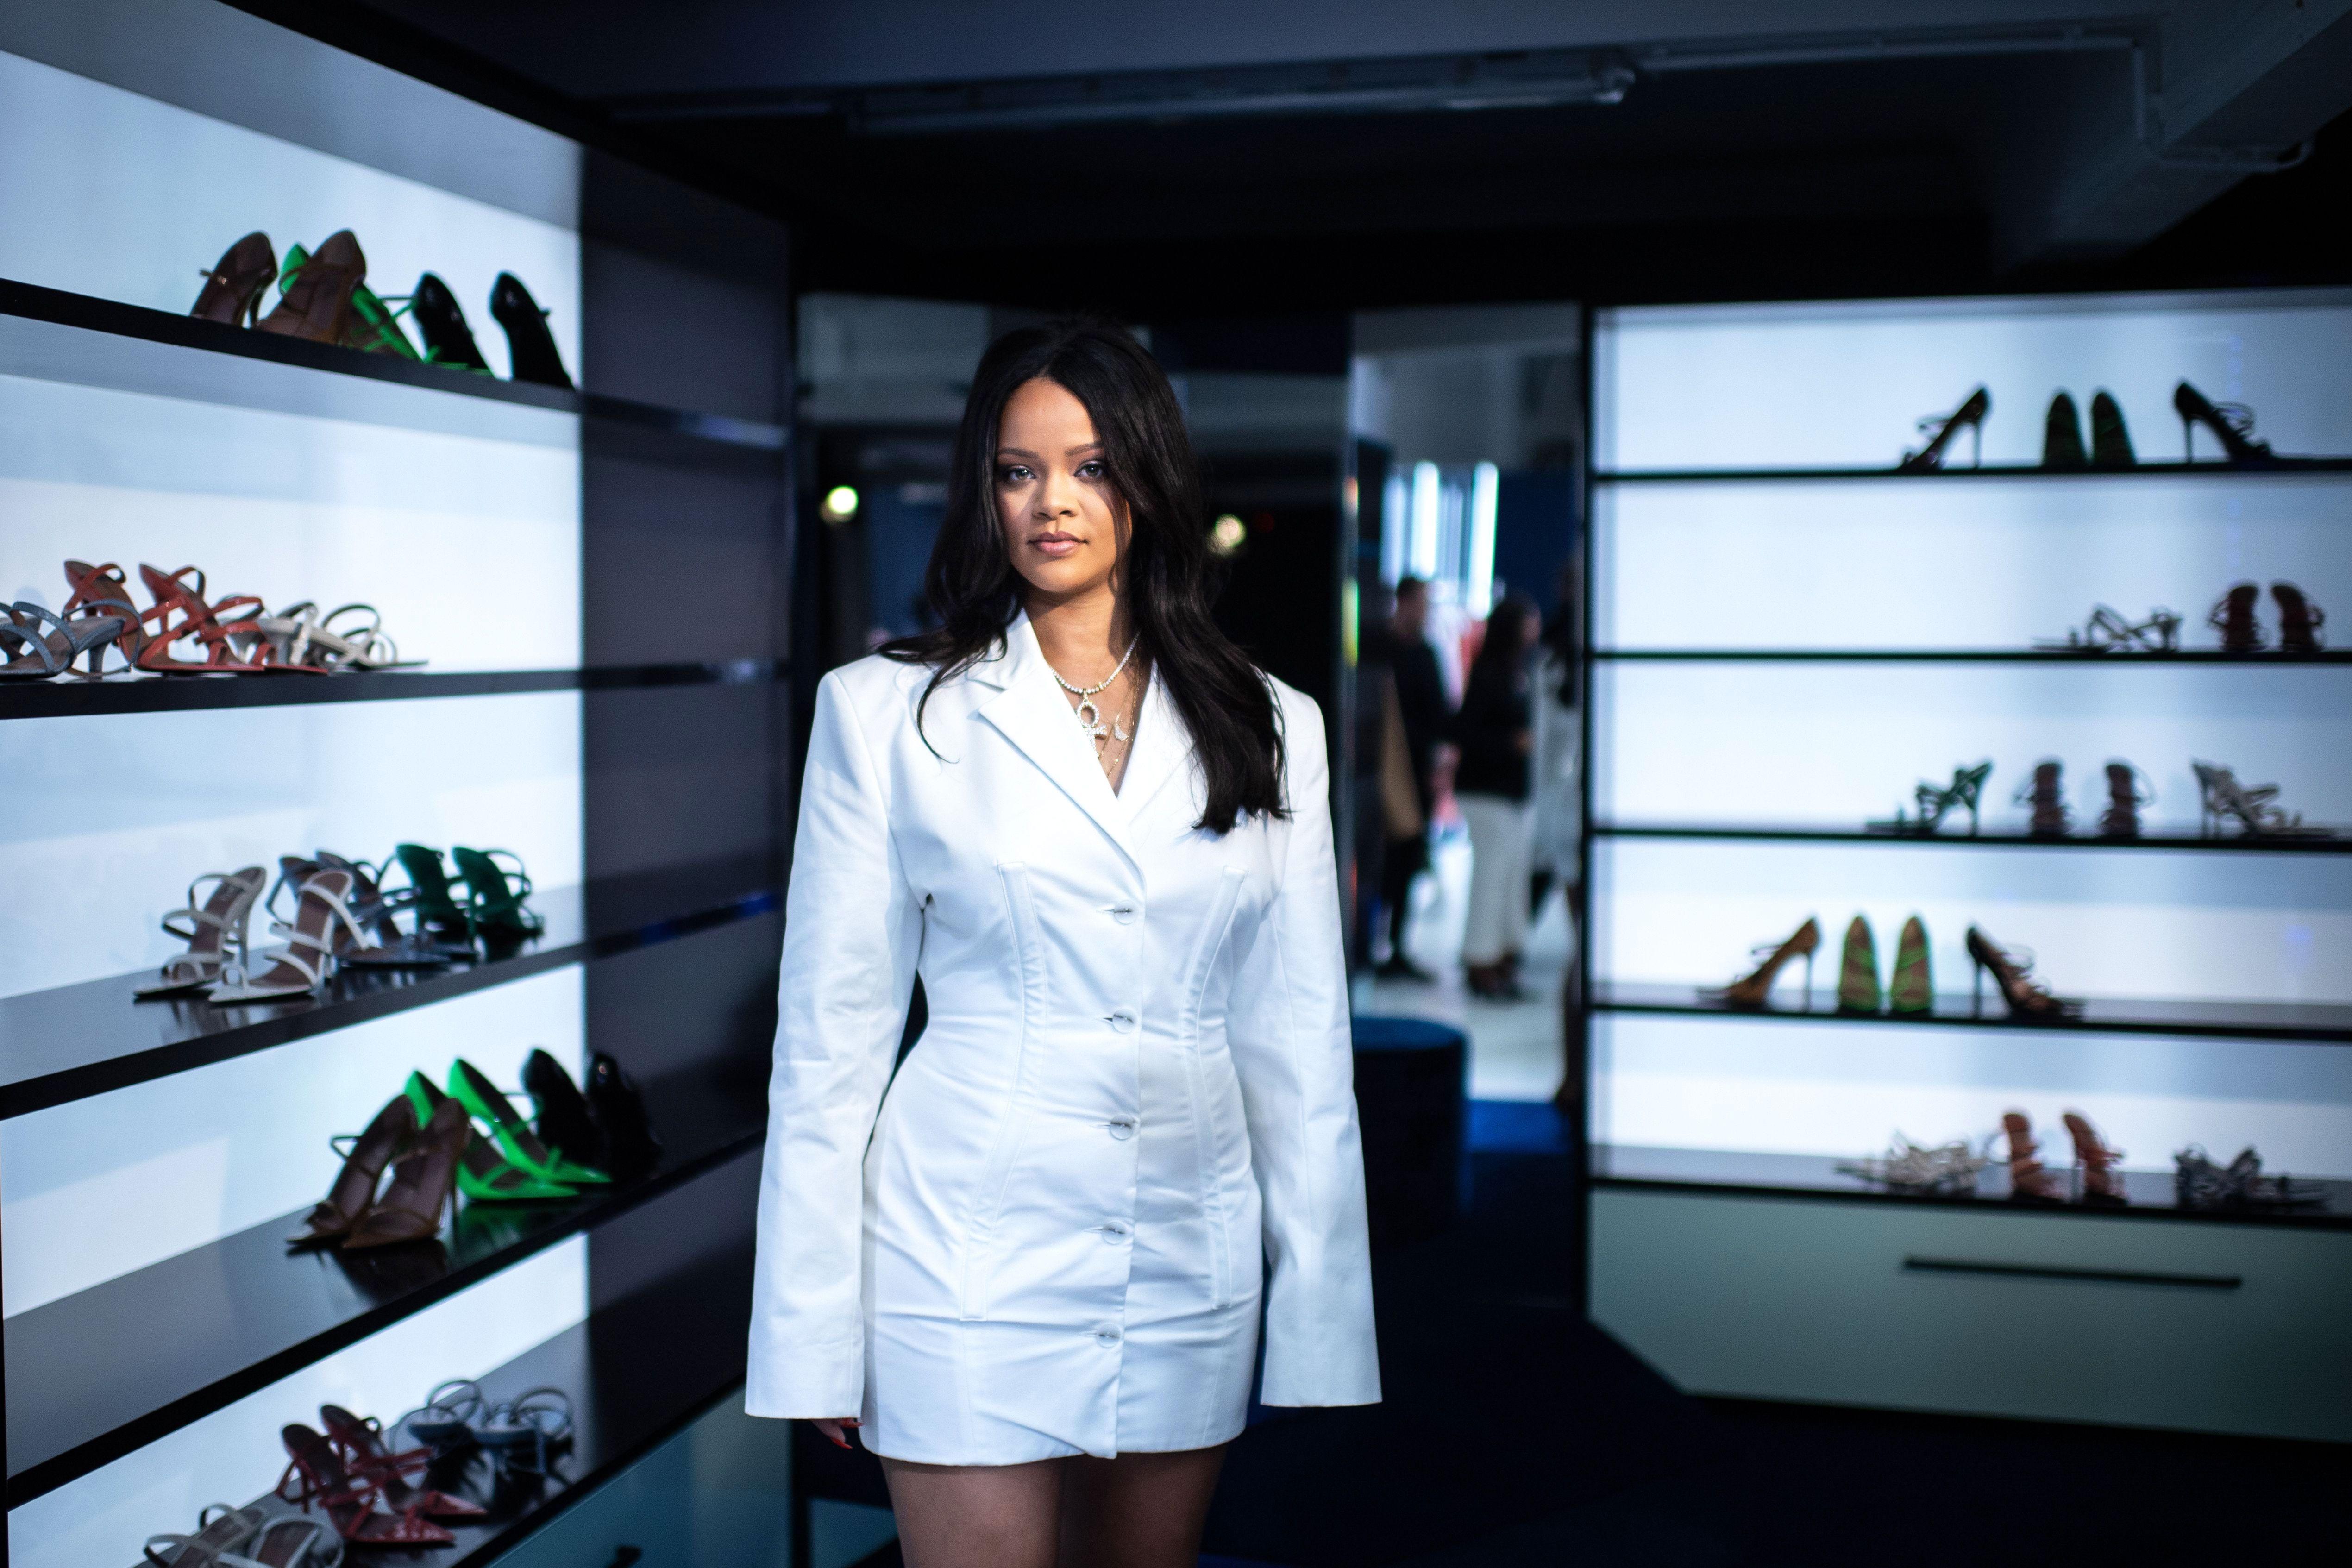 f97267374b Rihanna Wore a White Blazer Mini Dress to Launch Her Fenty Fashion Line